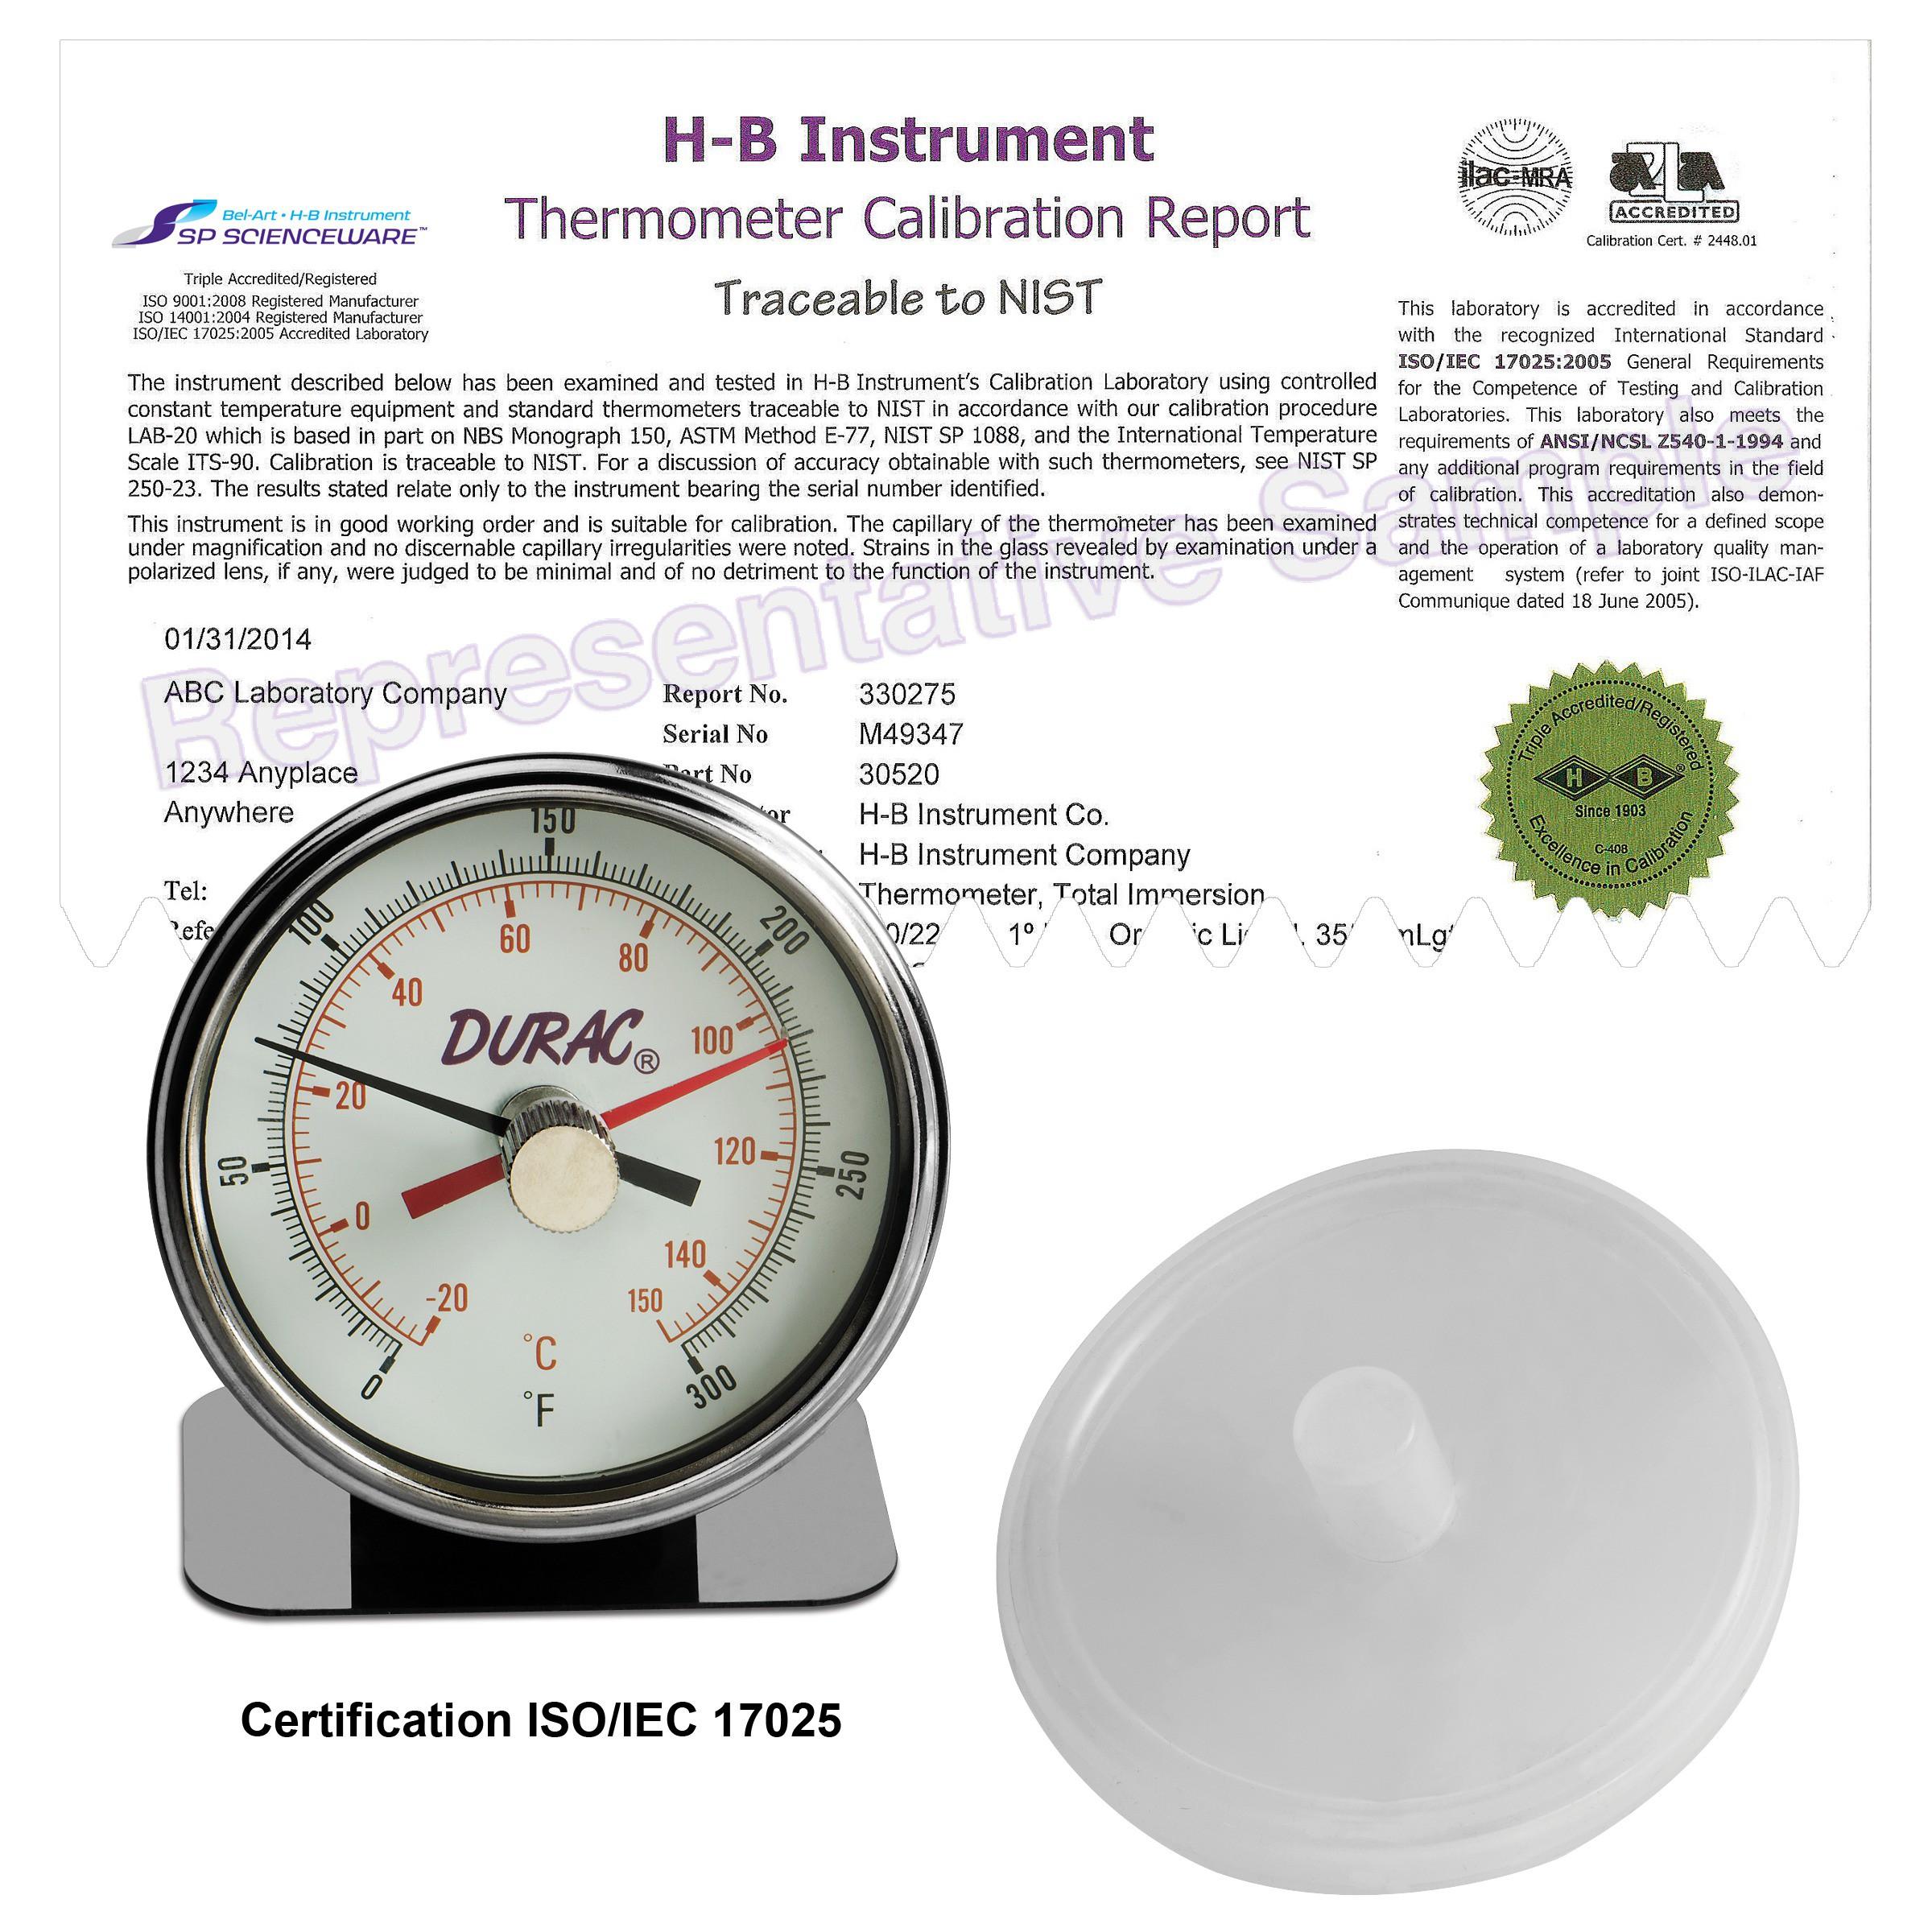 H-B DURAC Maximum Registering / Autoclave Bi-Metal Thermometer; -20 to 150C (0 to 300F), Individual Calibration Report